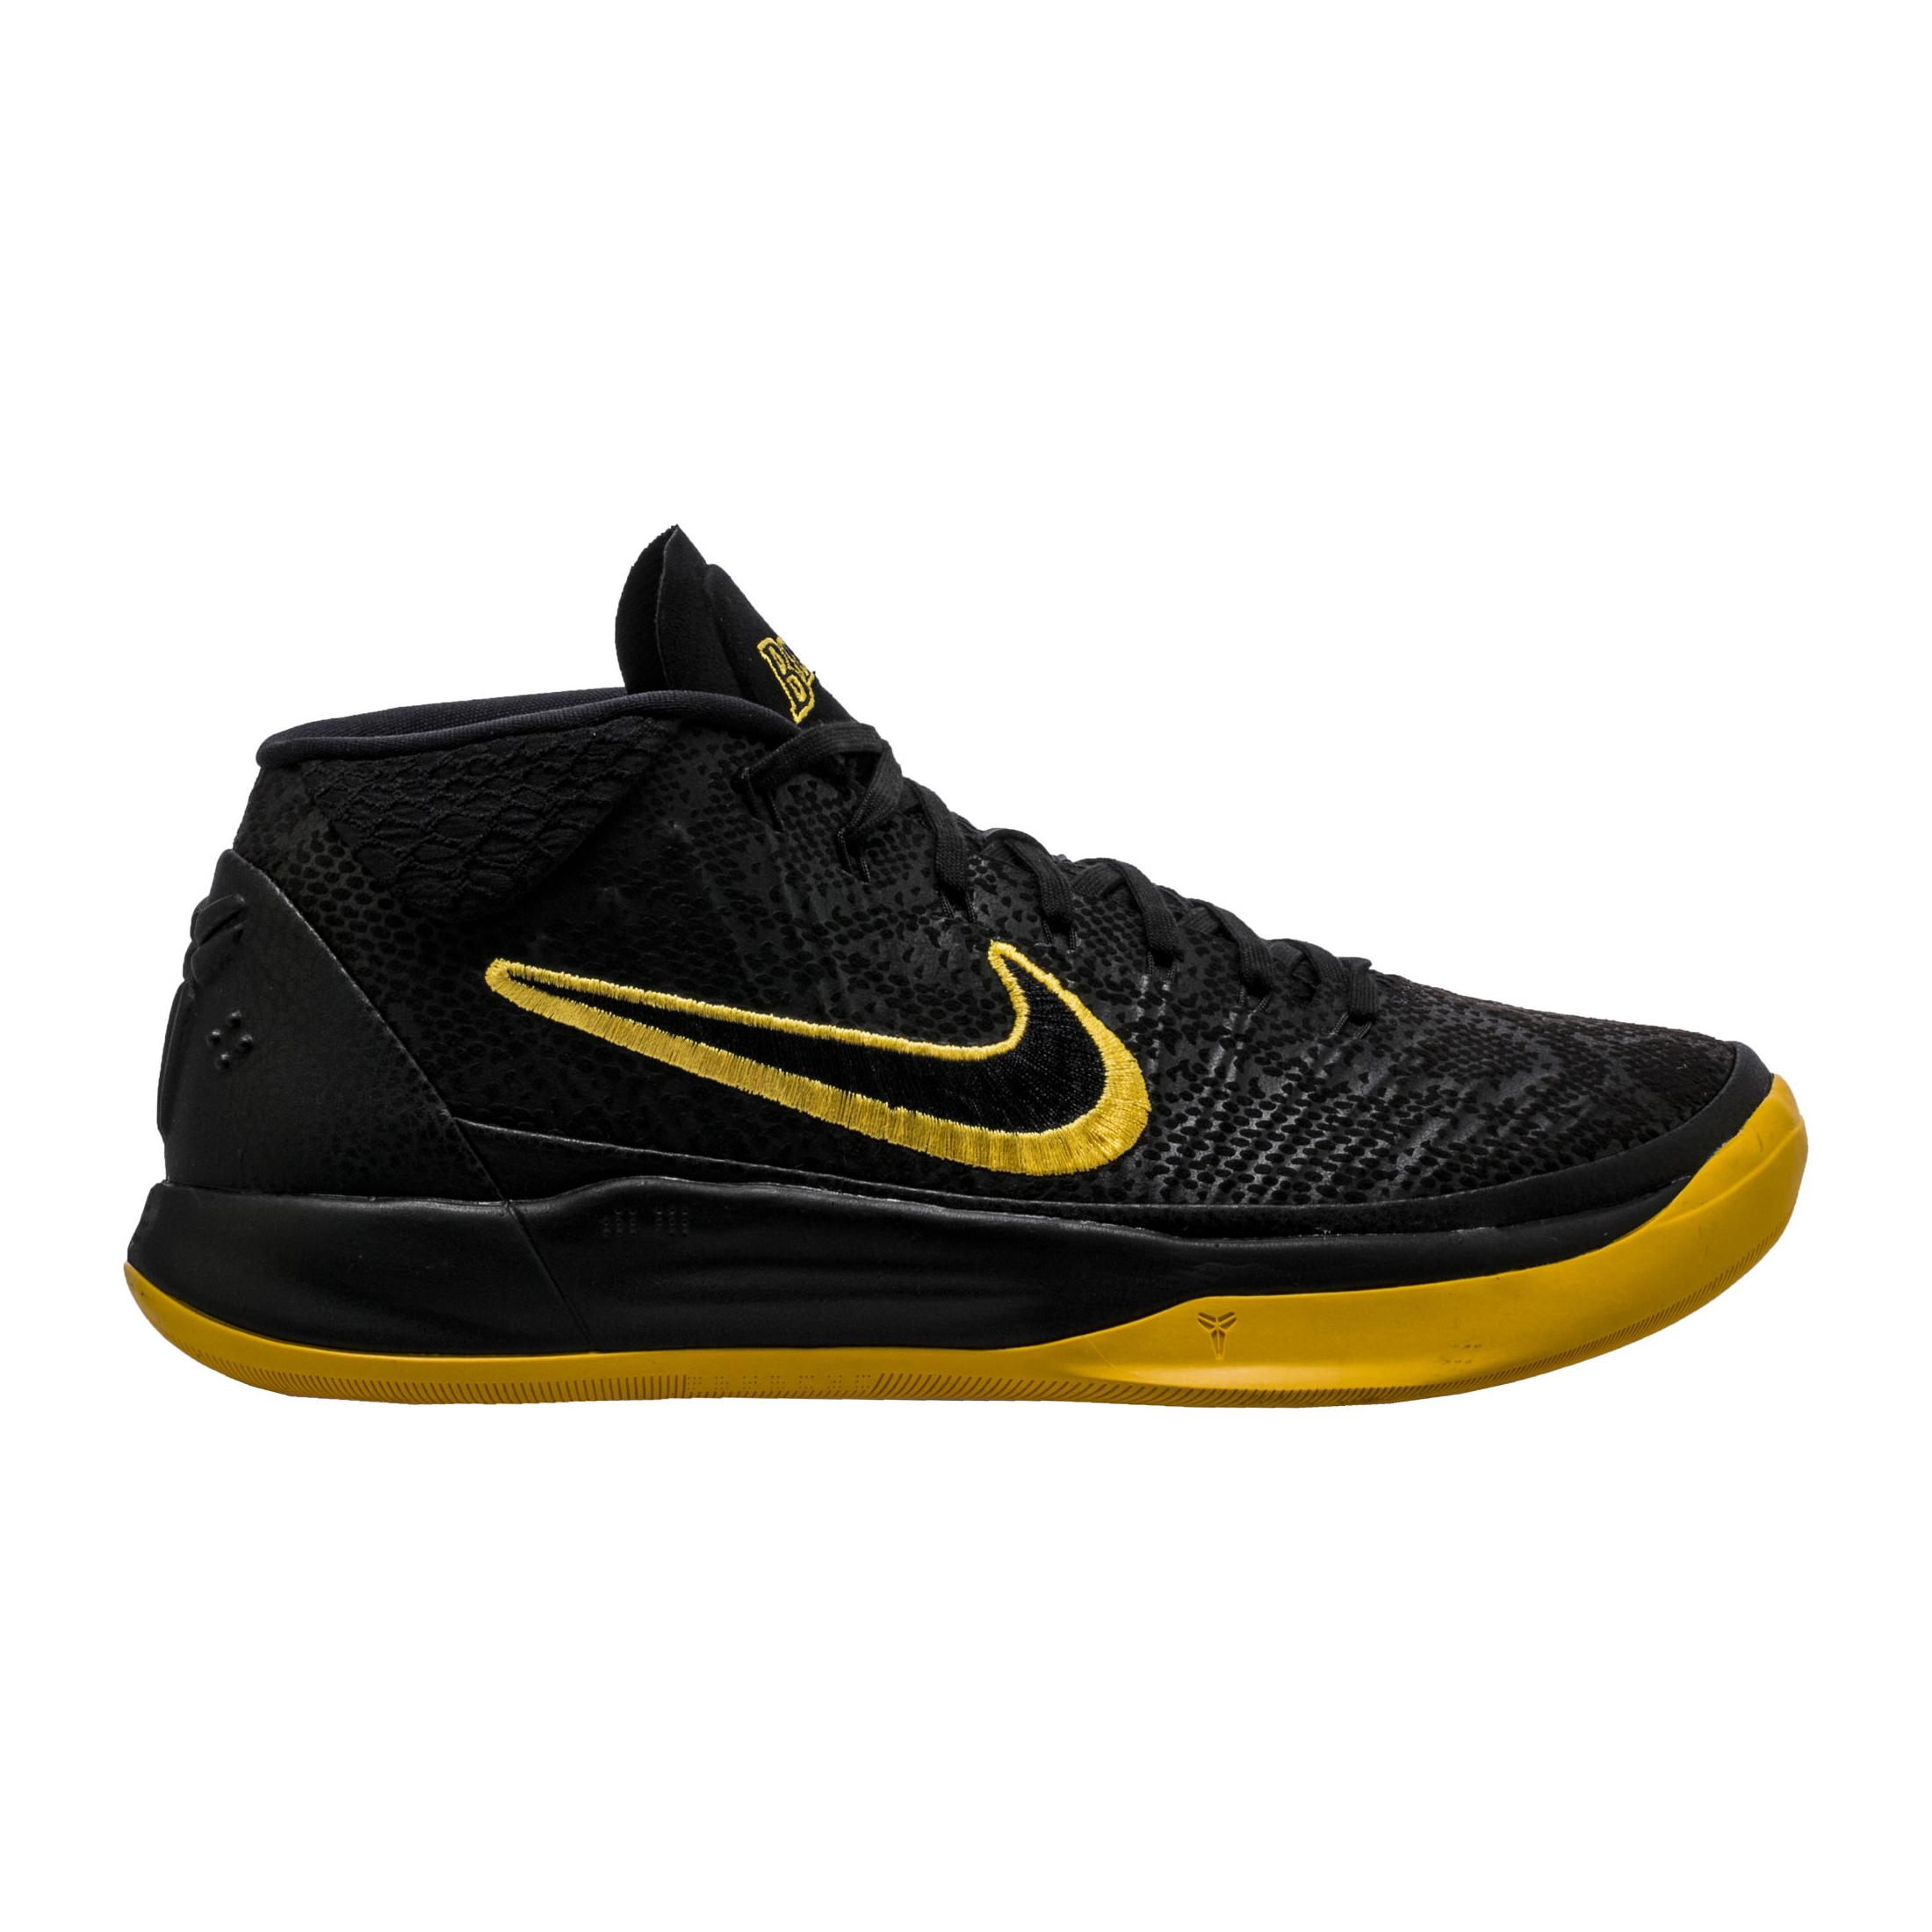 Nike Kobe AD Black Mamba City Edition 4